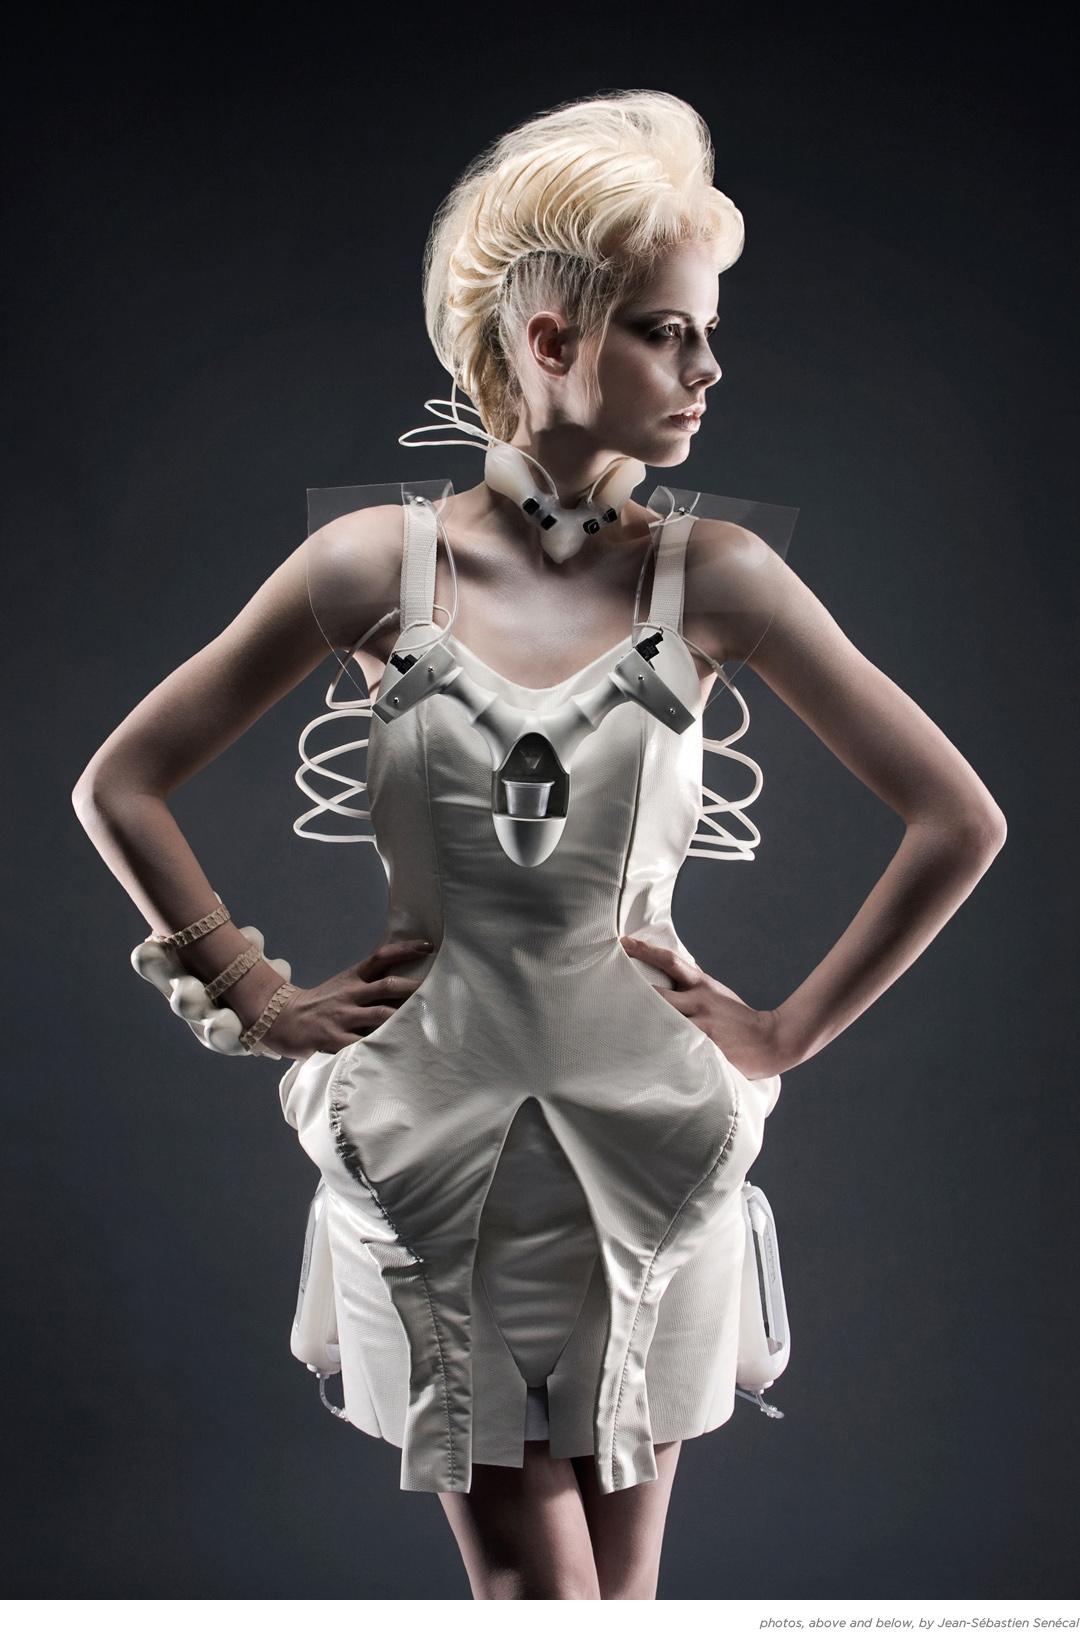 DareDroid 2.0 cocktailmaking dress